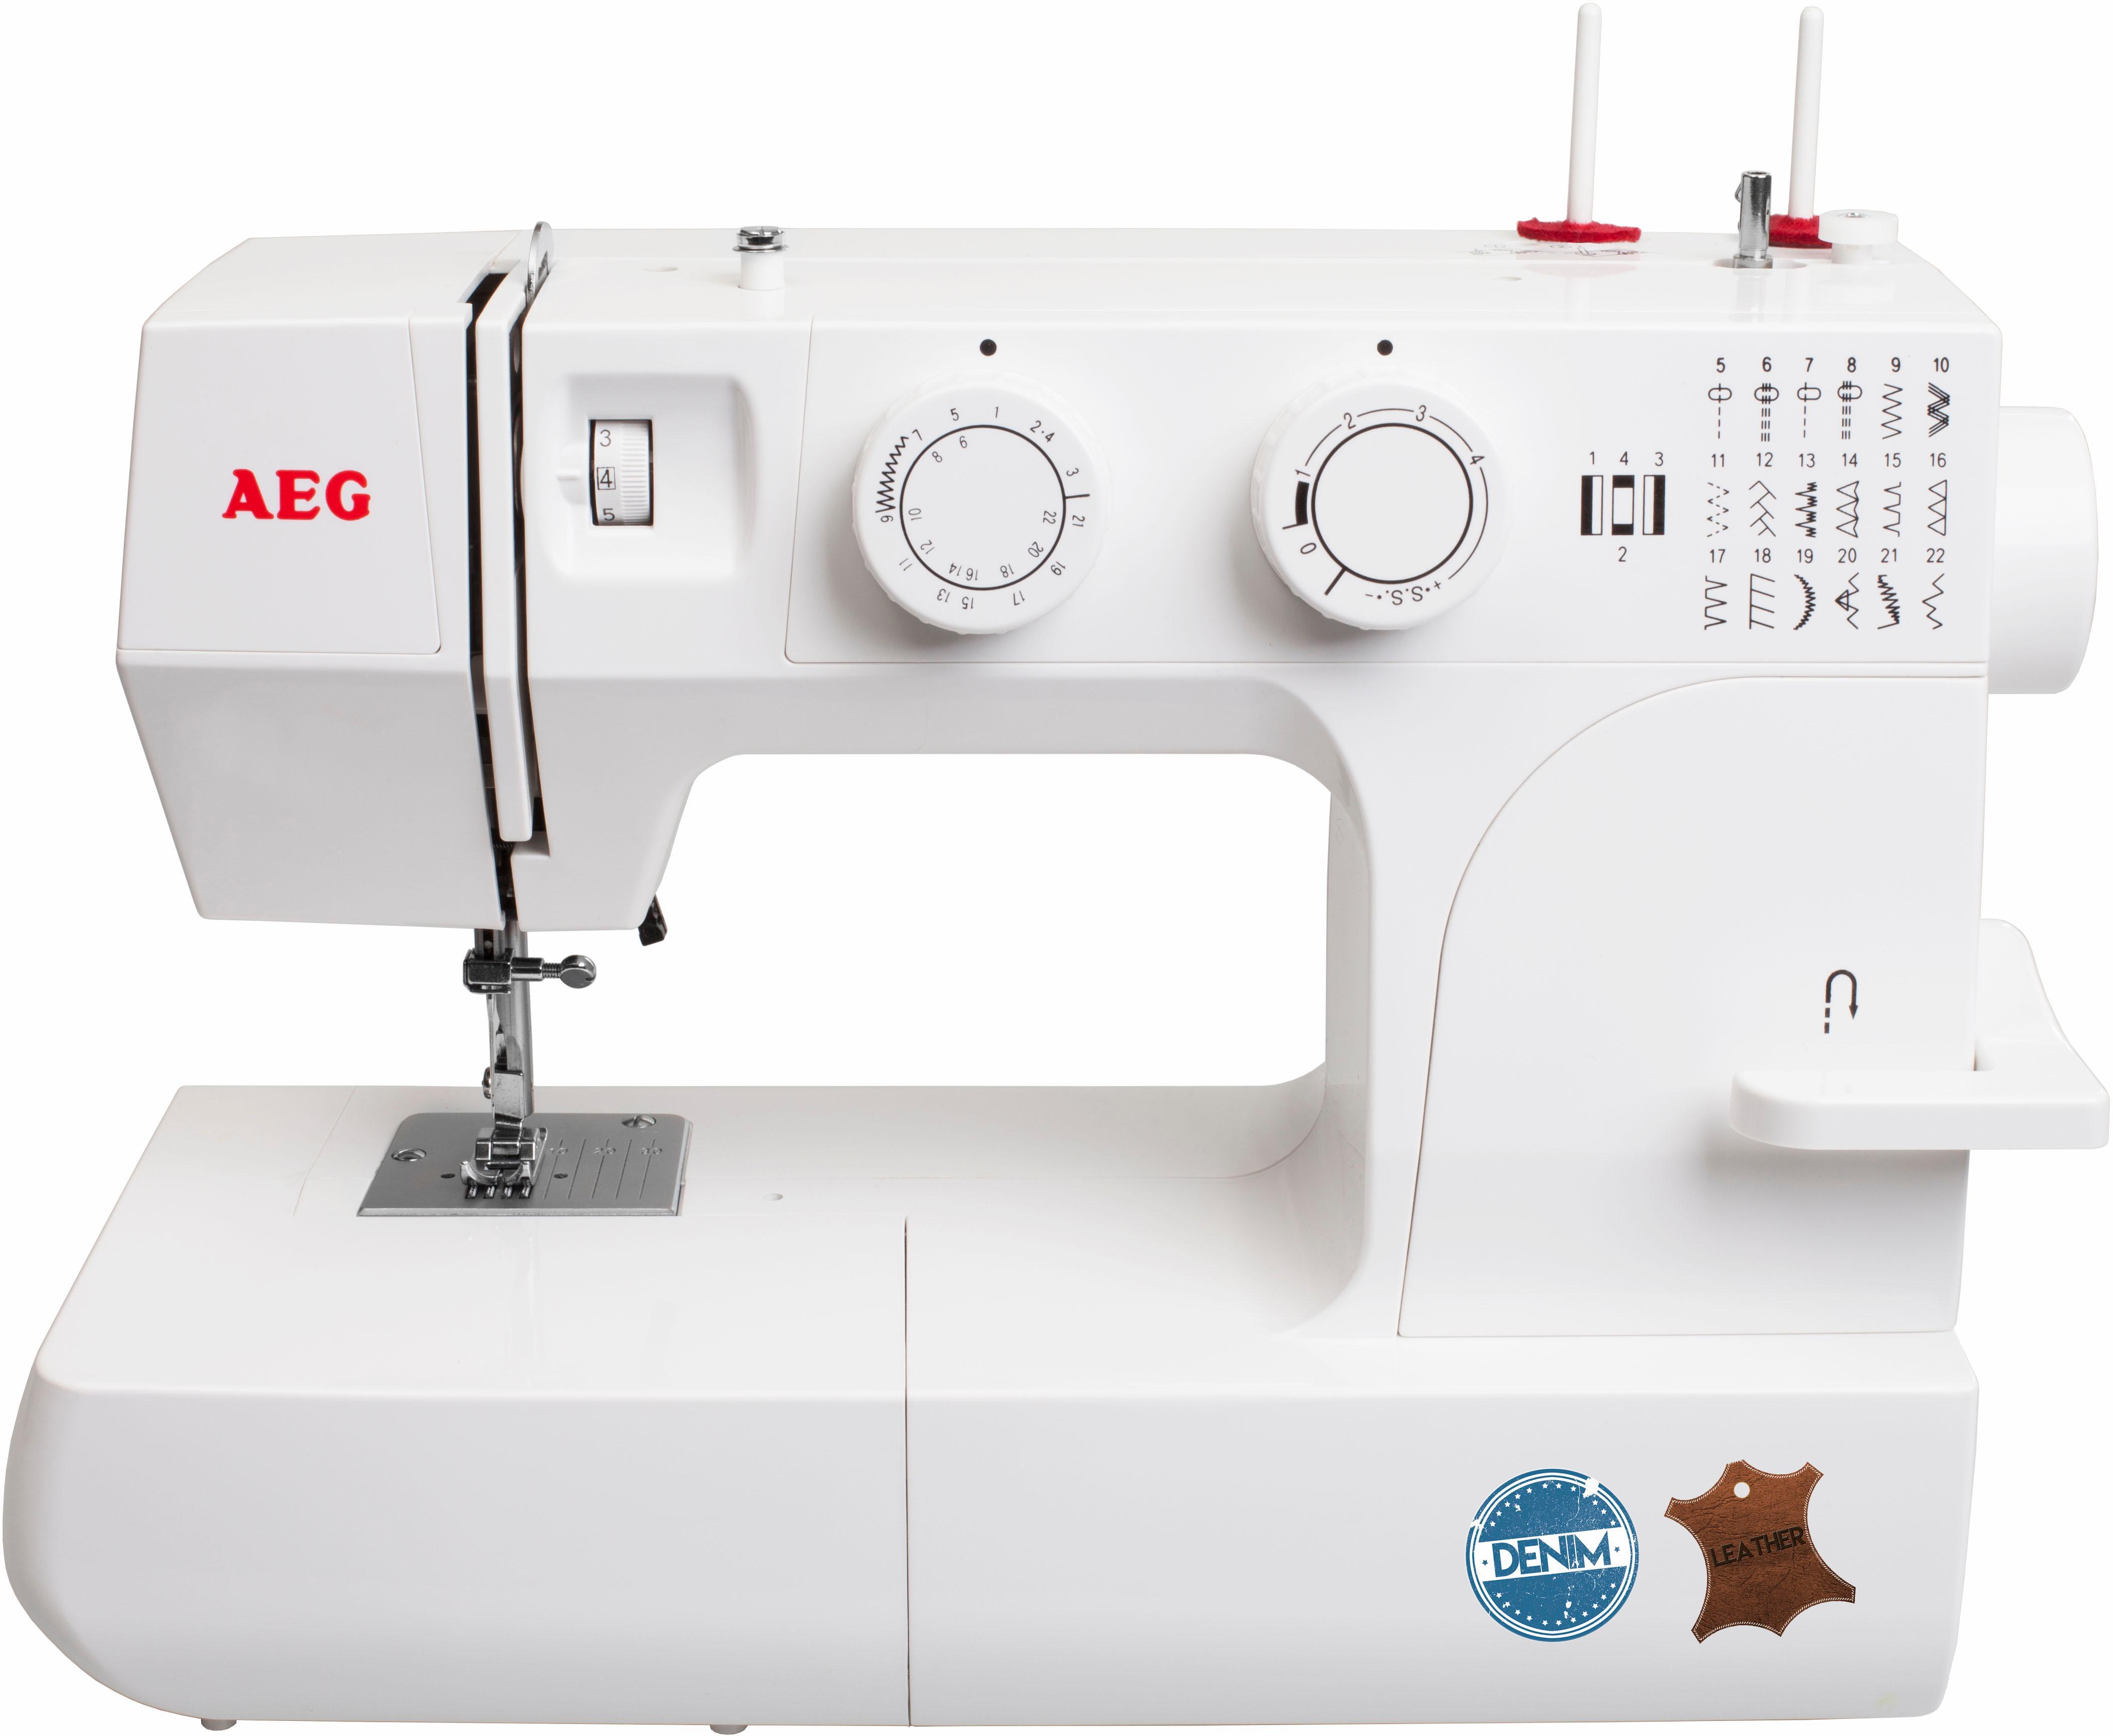 AEG Nähmaschine 15DLK, 22 Nähprogramme | Flur & Diele > Haushaltsgeräte > Strick und Nähmaschinen | Weiß | Denim - Leder | AEG